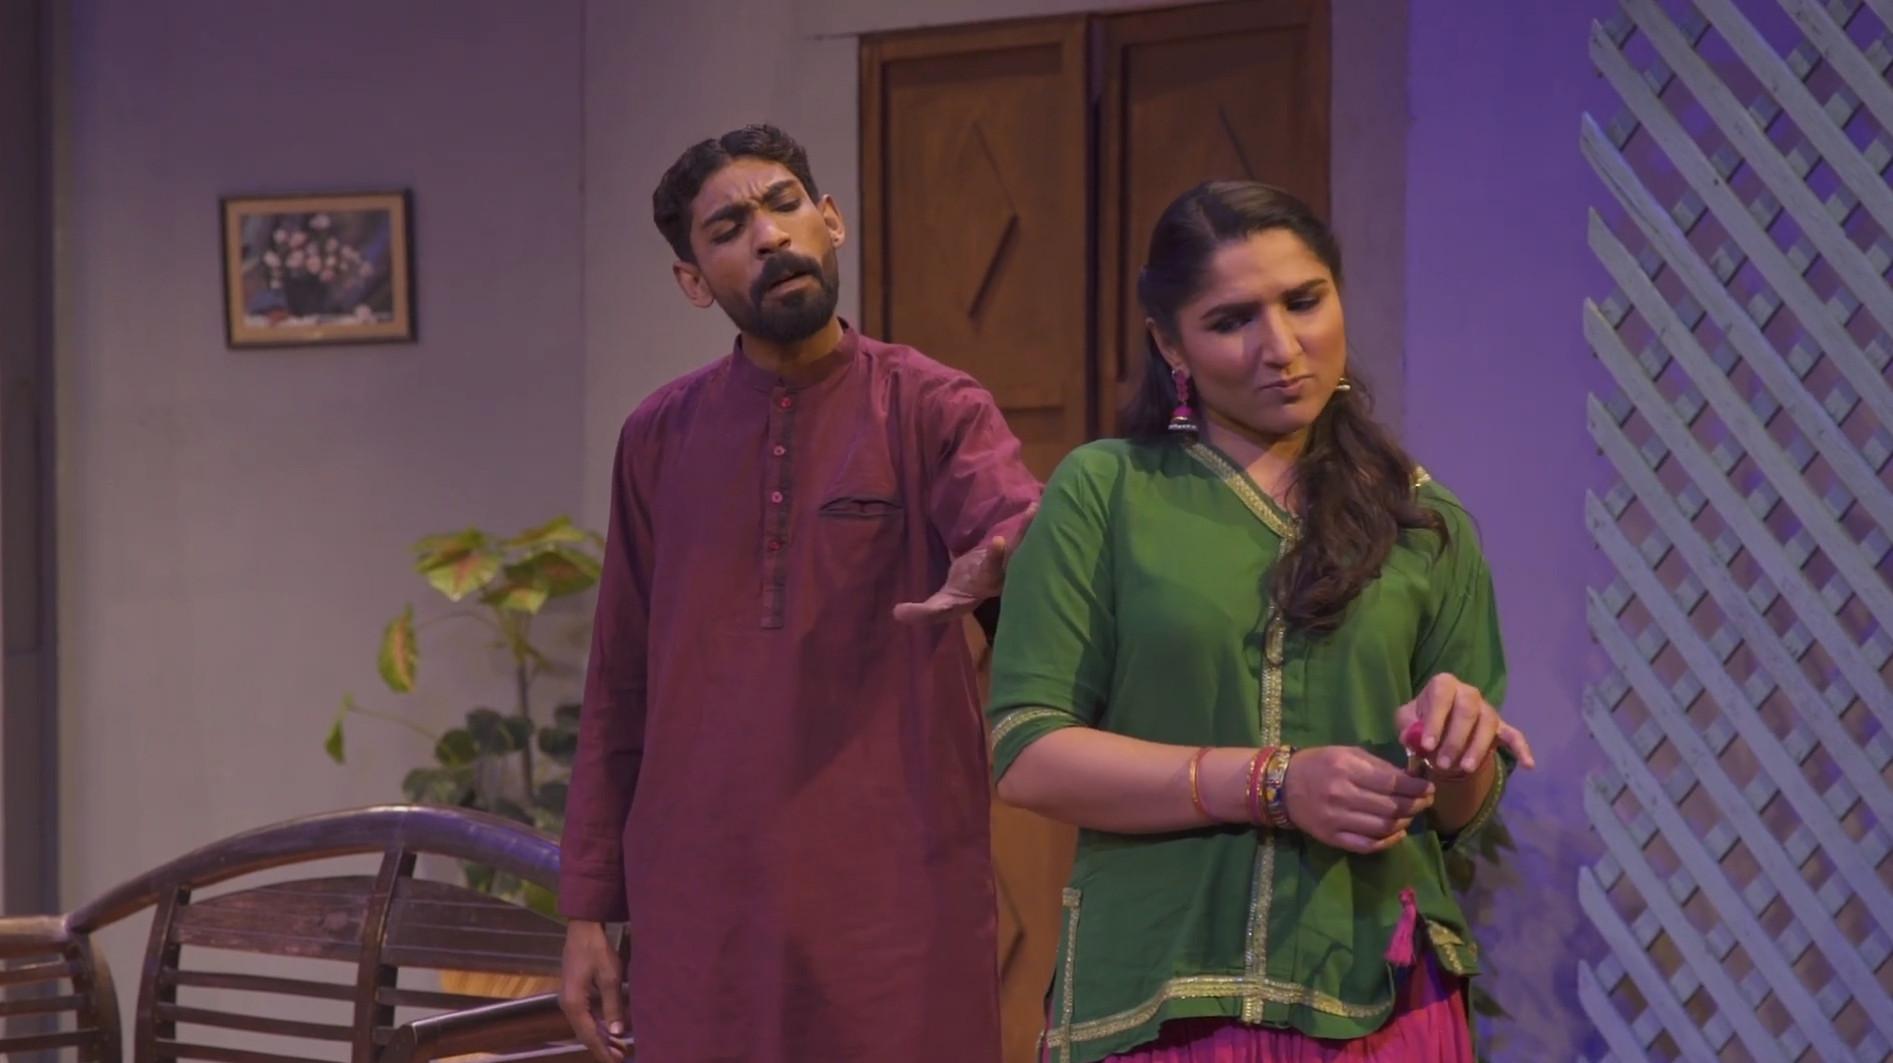 A still from 'Turram ka Makaan' released digitally, starring Shabana Hassan and Faizan Chawla